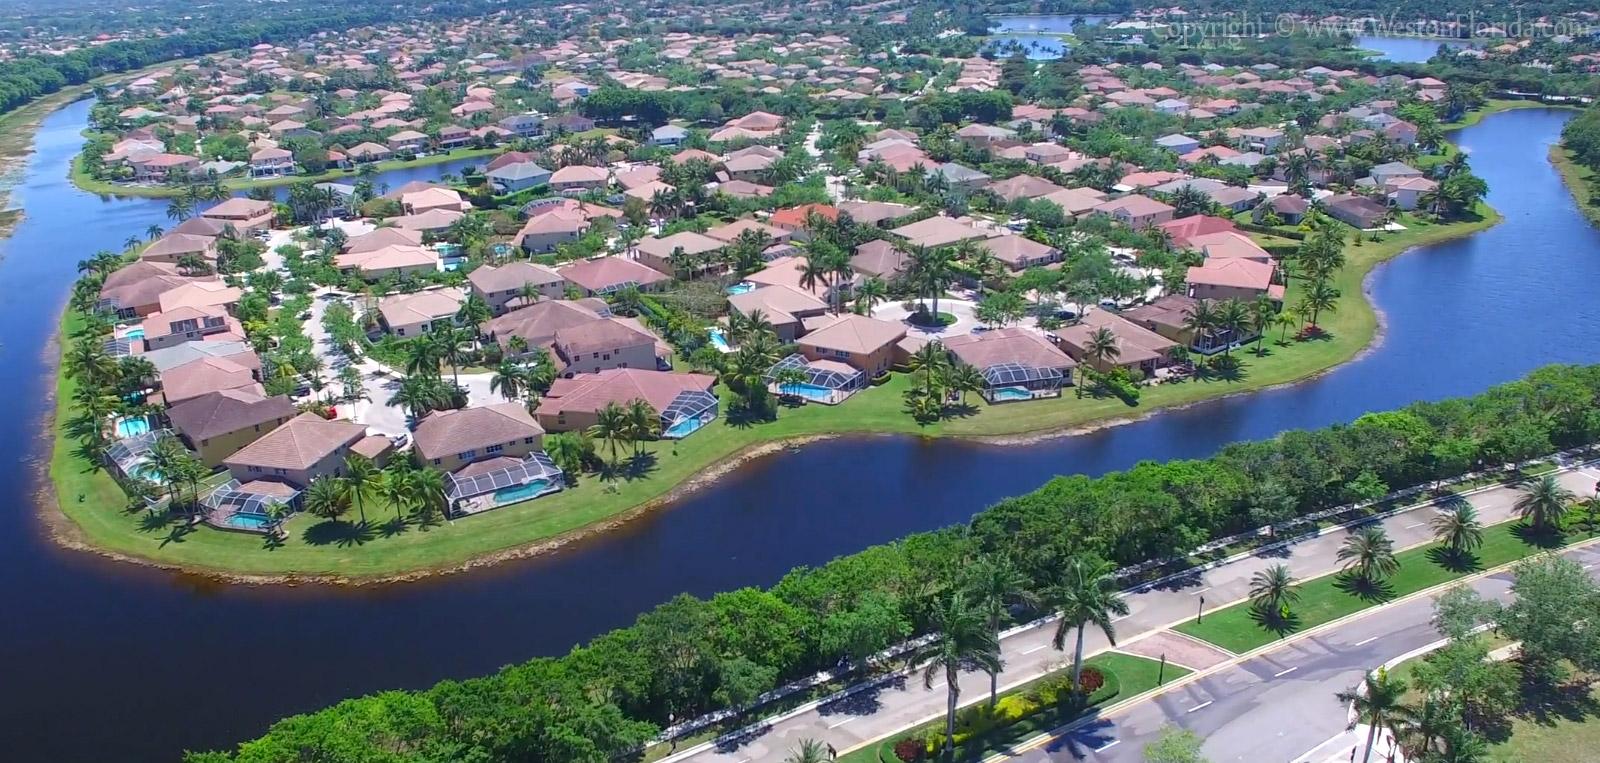 Residential area in Weston Florida